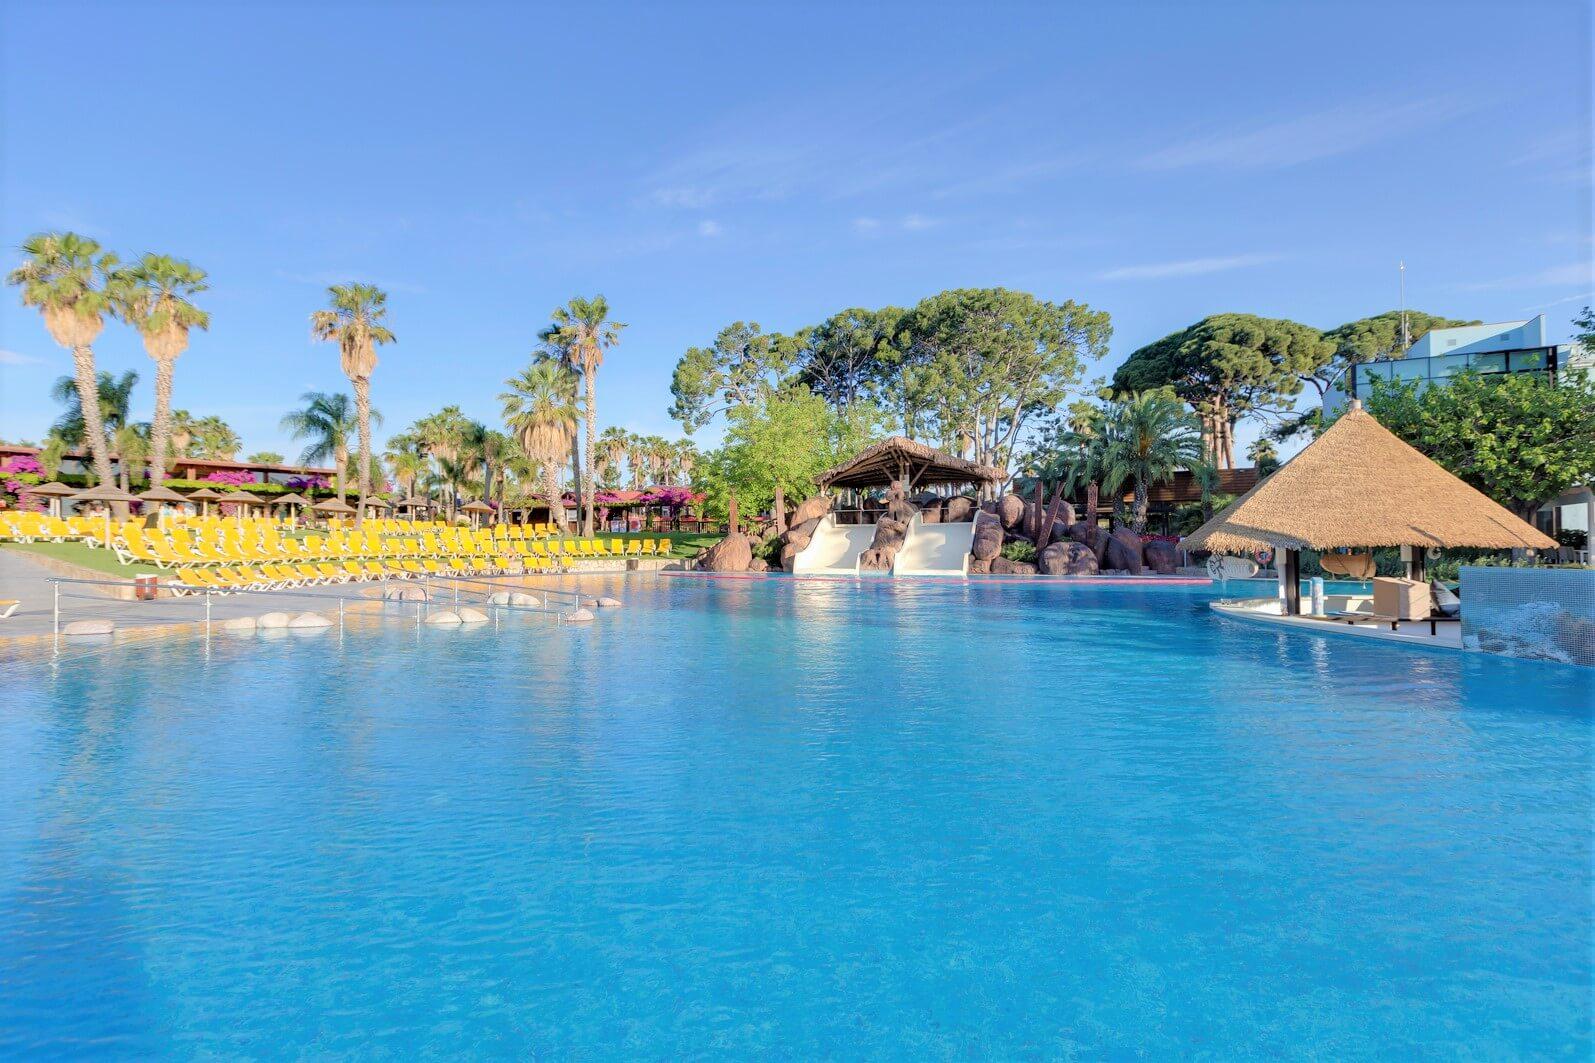 The Best Family Resort On The Costa Daurada